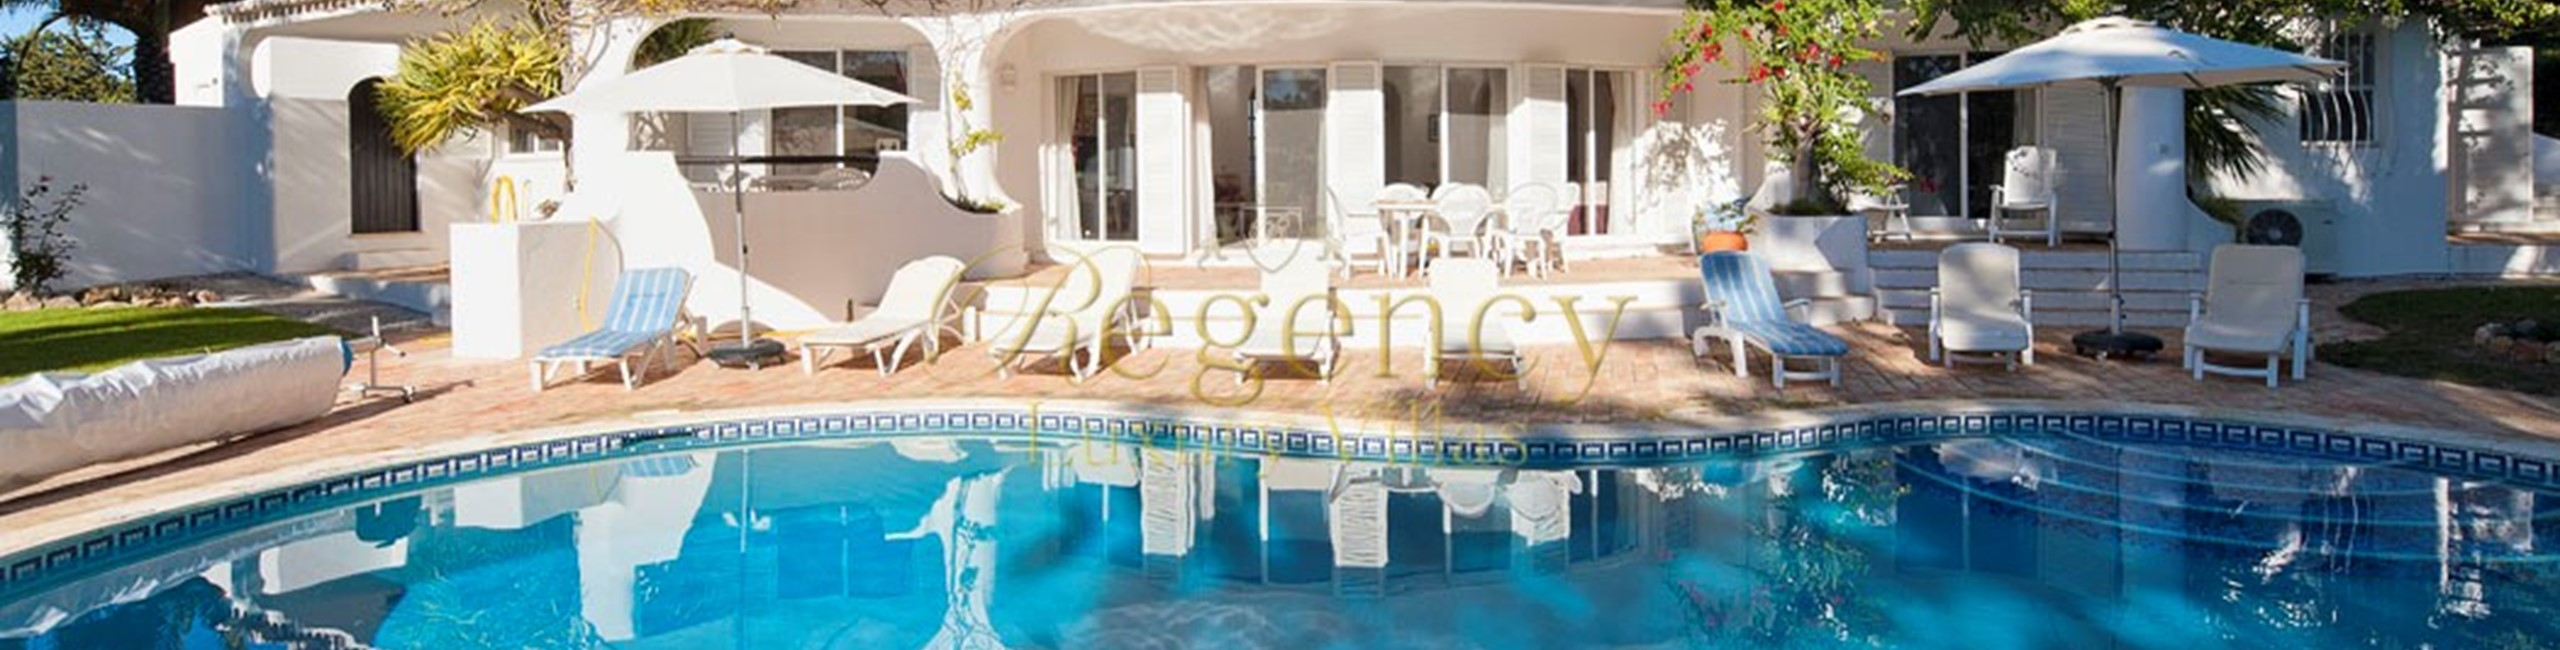 5 Bed Luxury Villa To Rent In Quinta Do Lago RLV 1